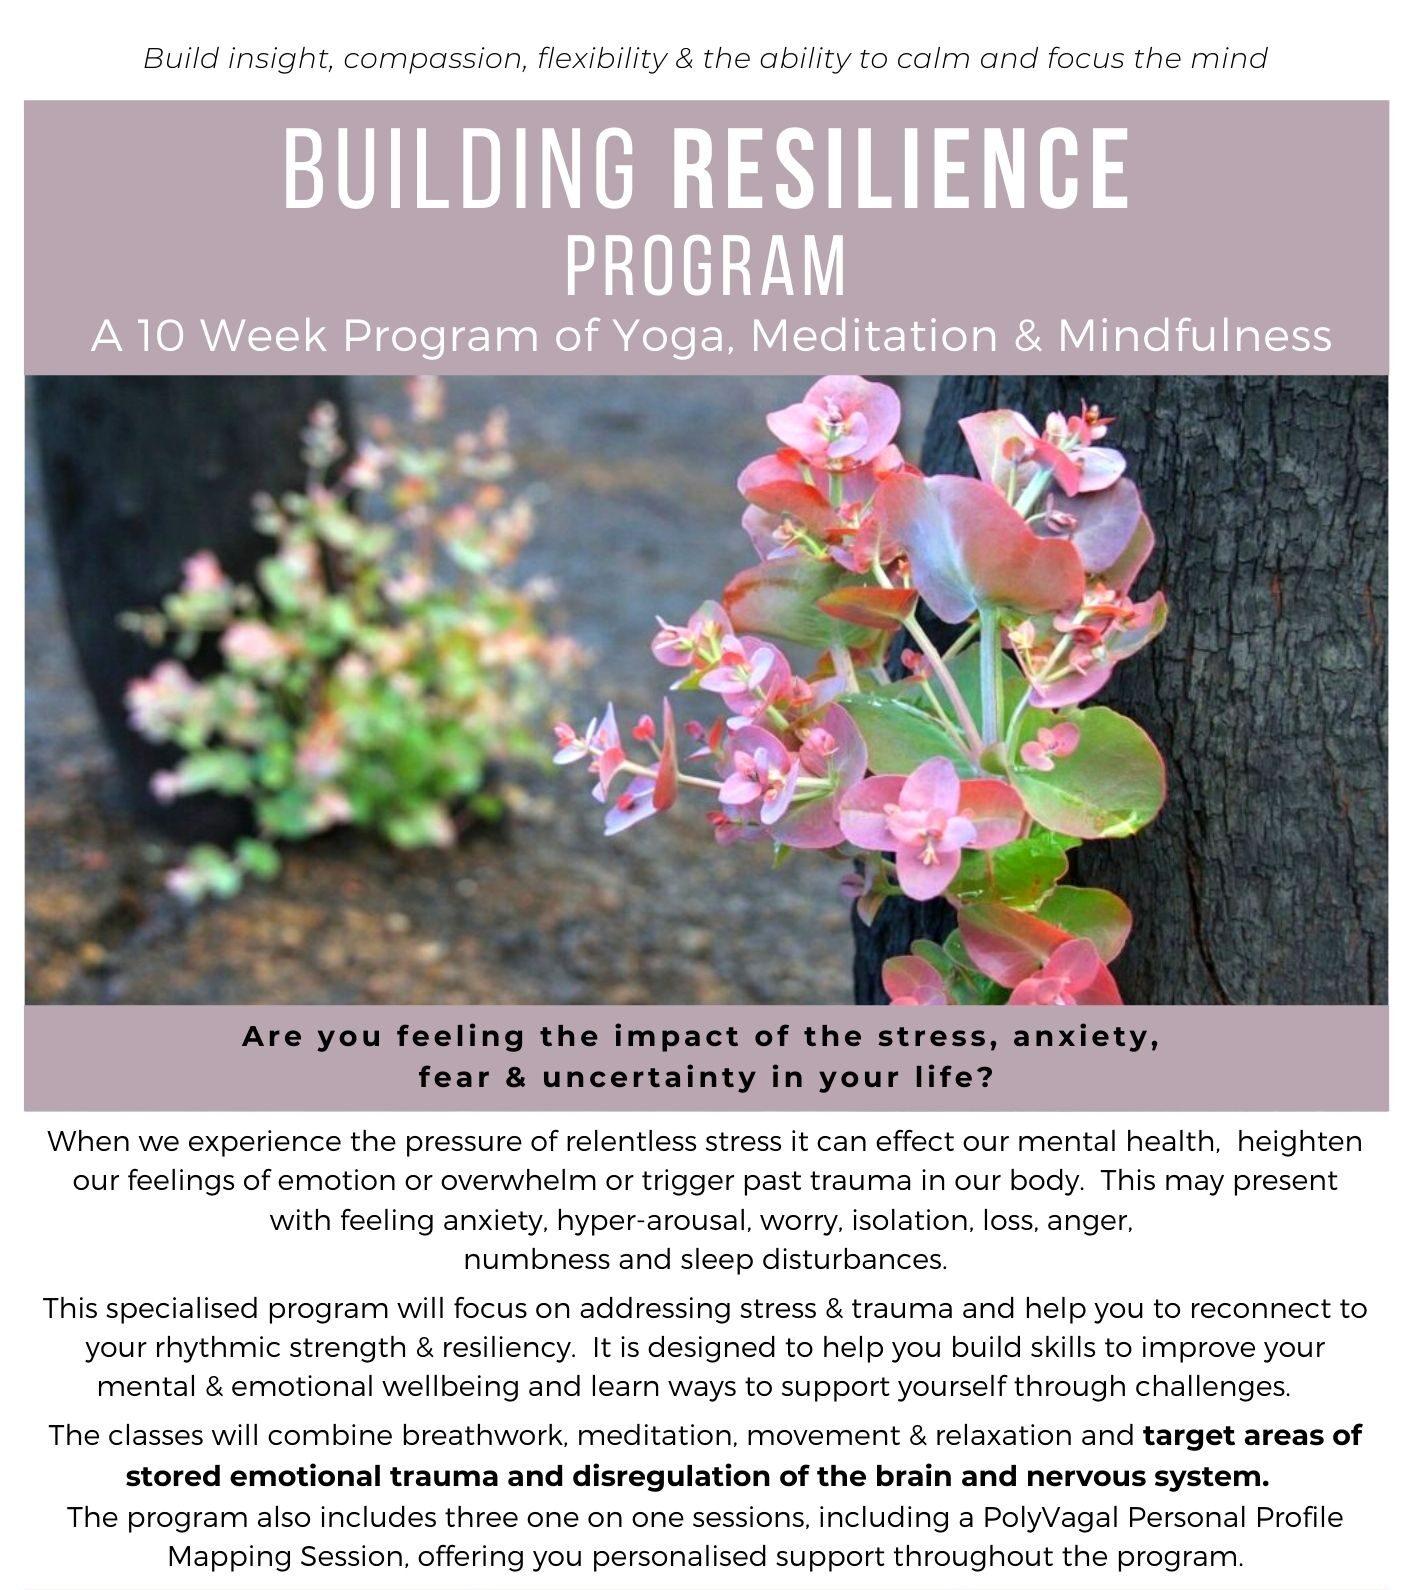 Building resilience program